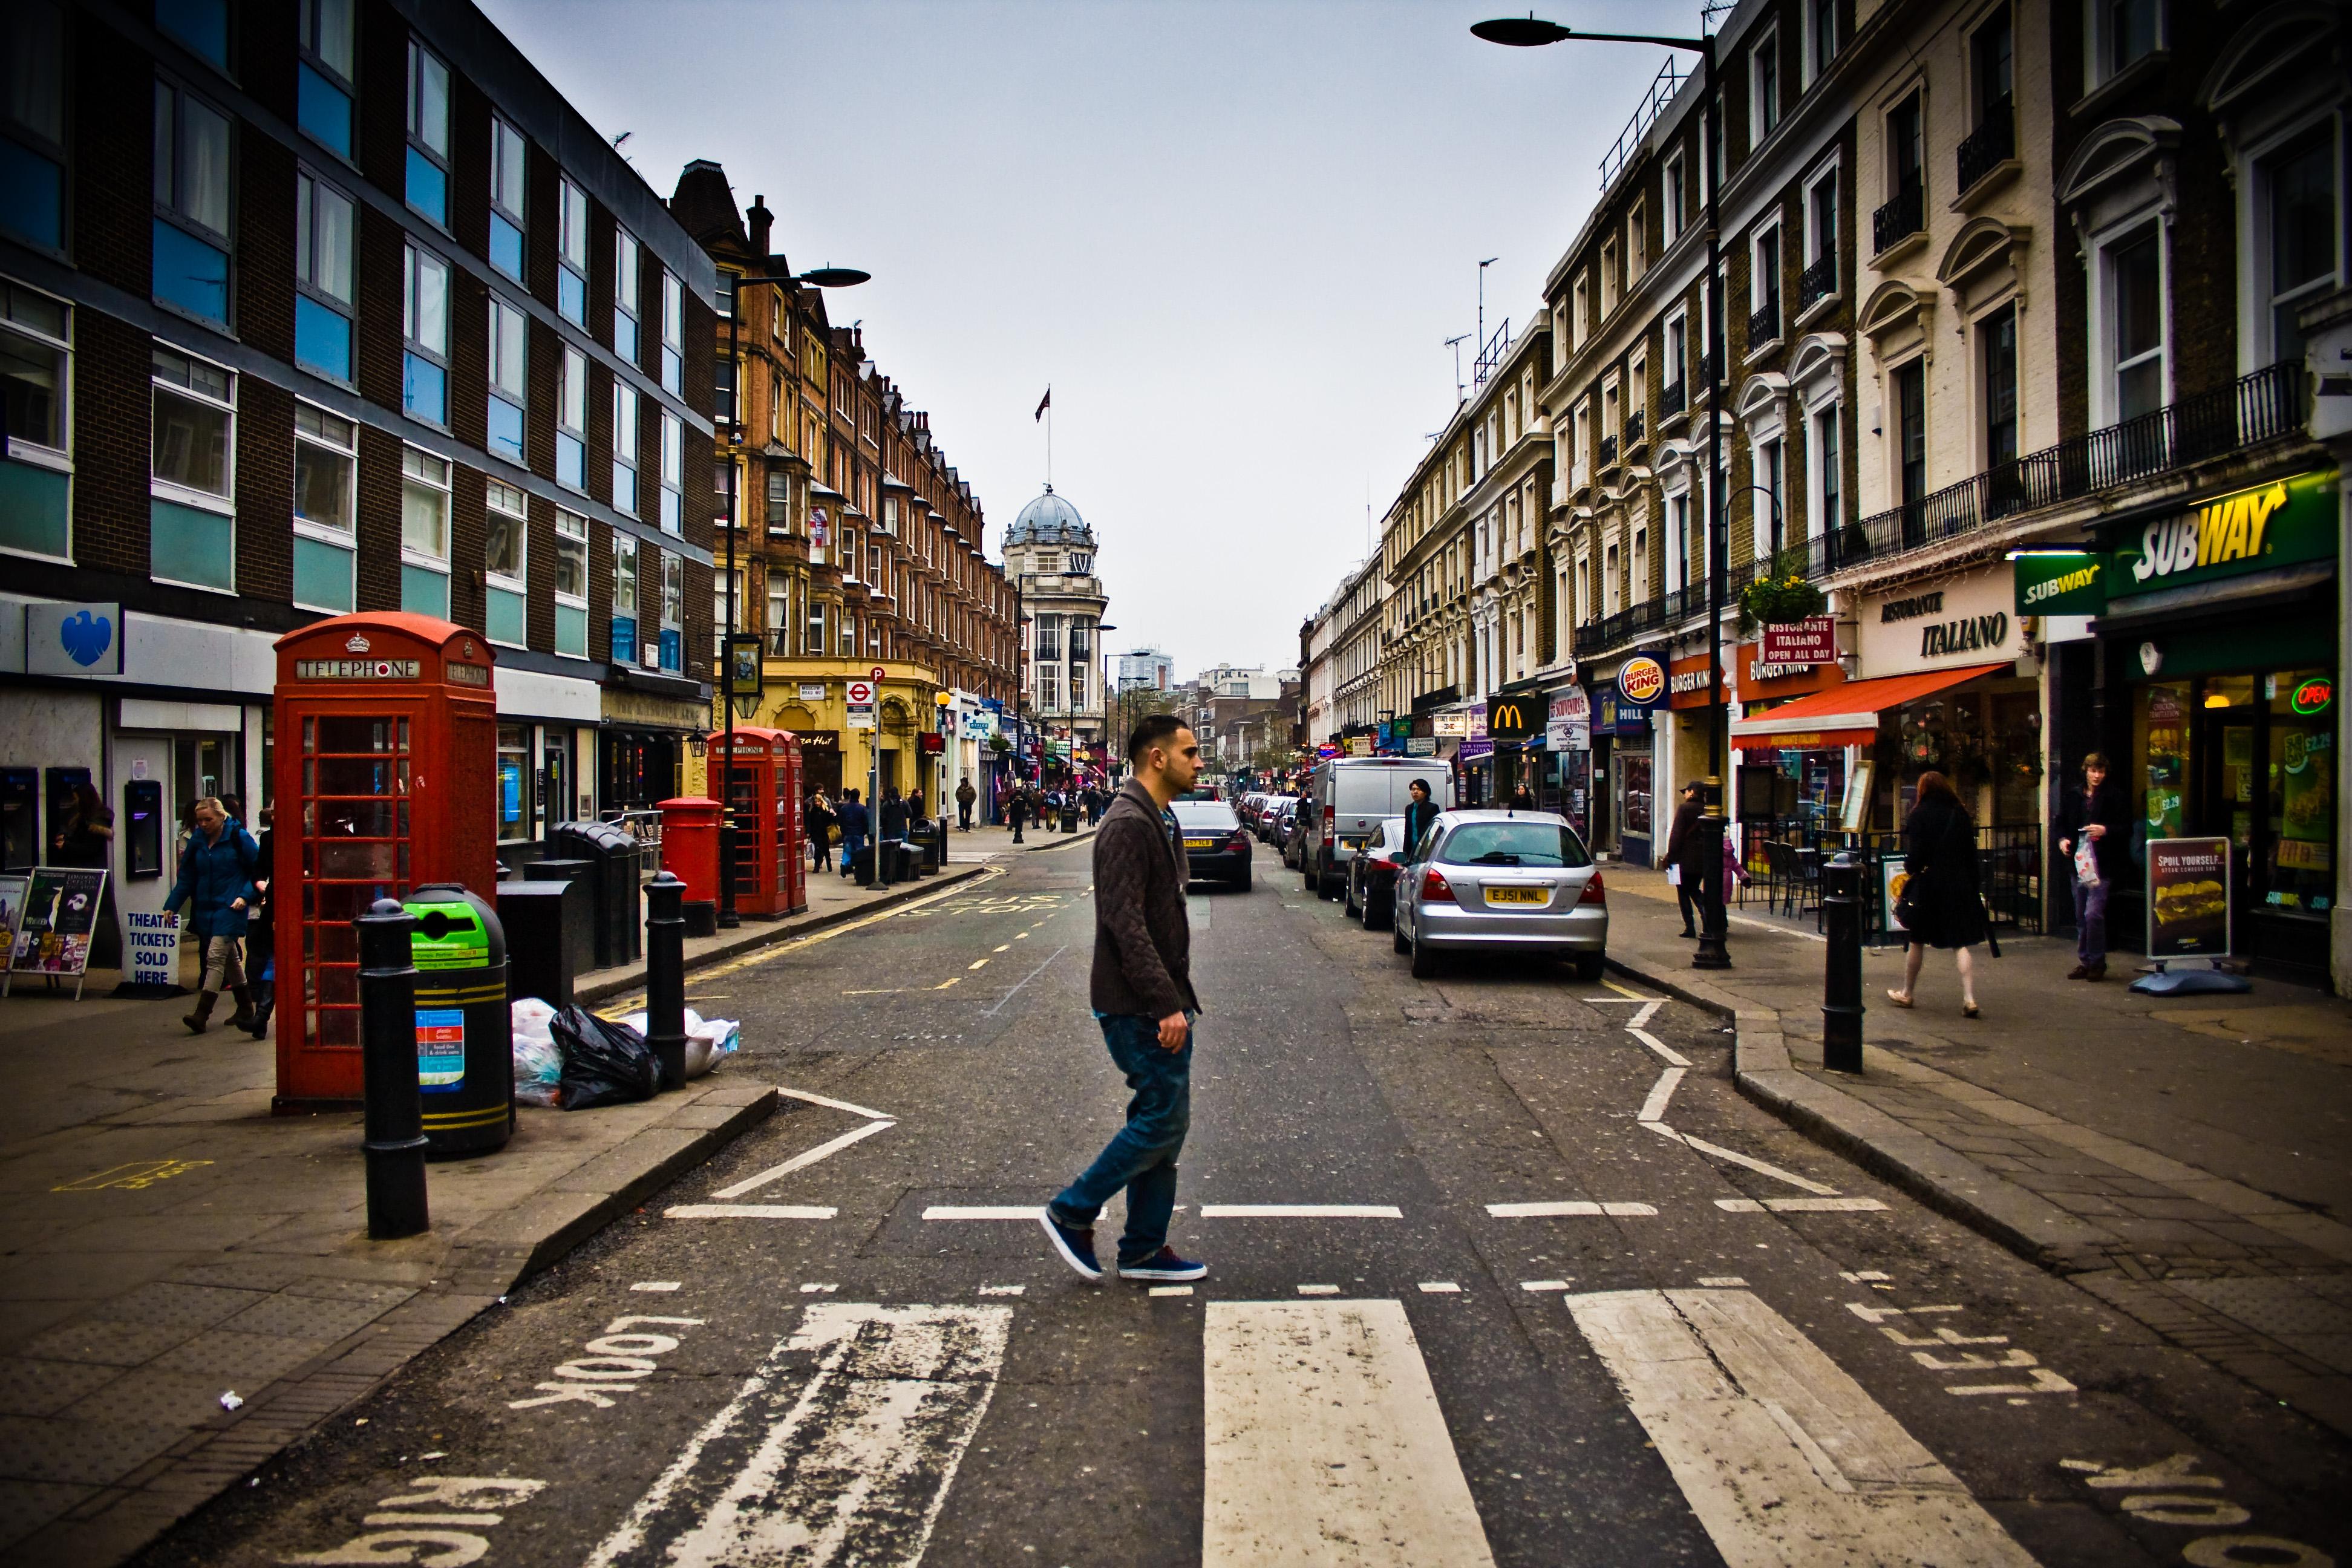 File:Queensway, London.jpg - Wikimedia Commons